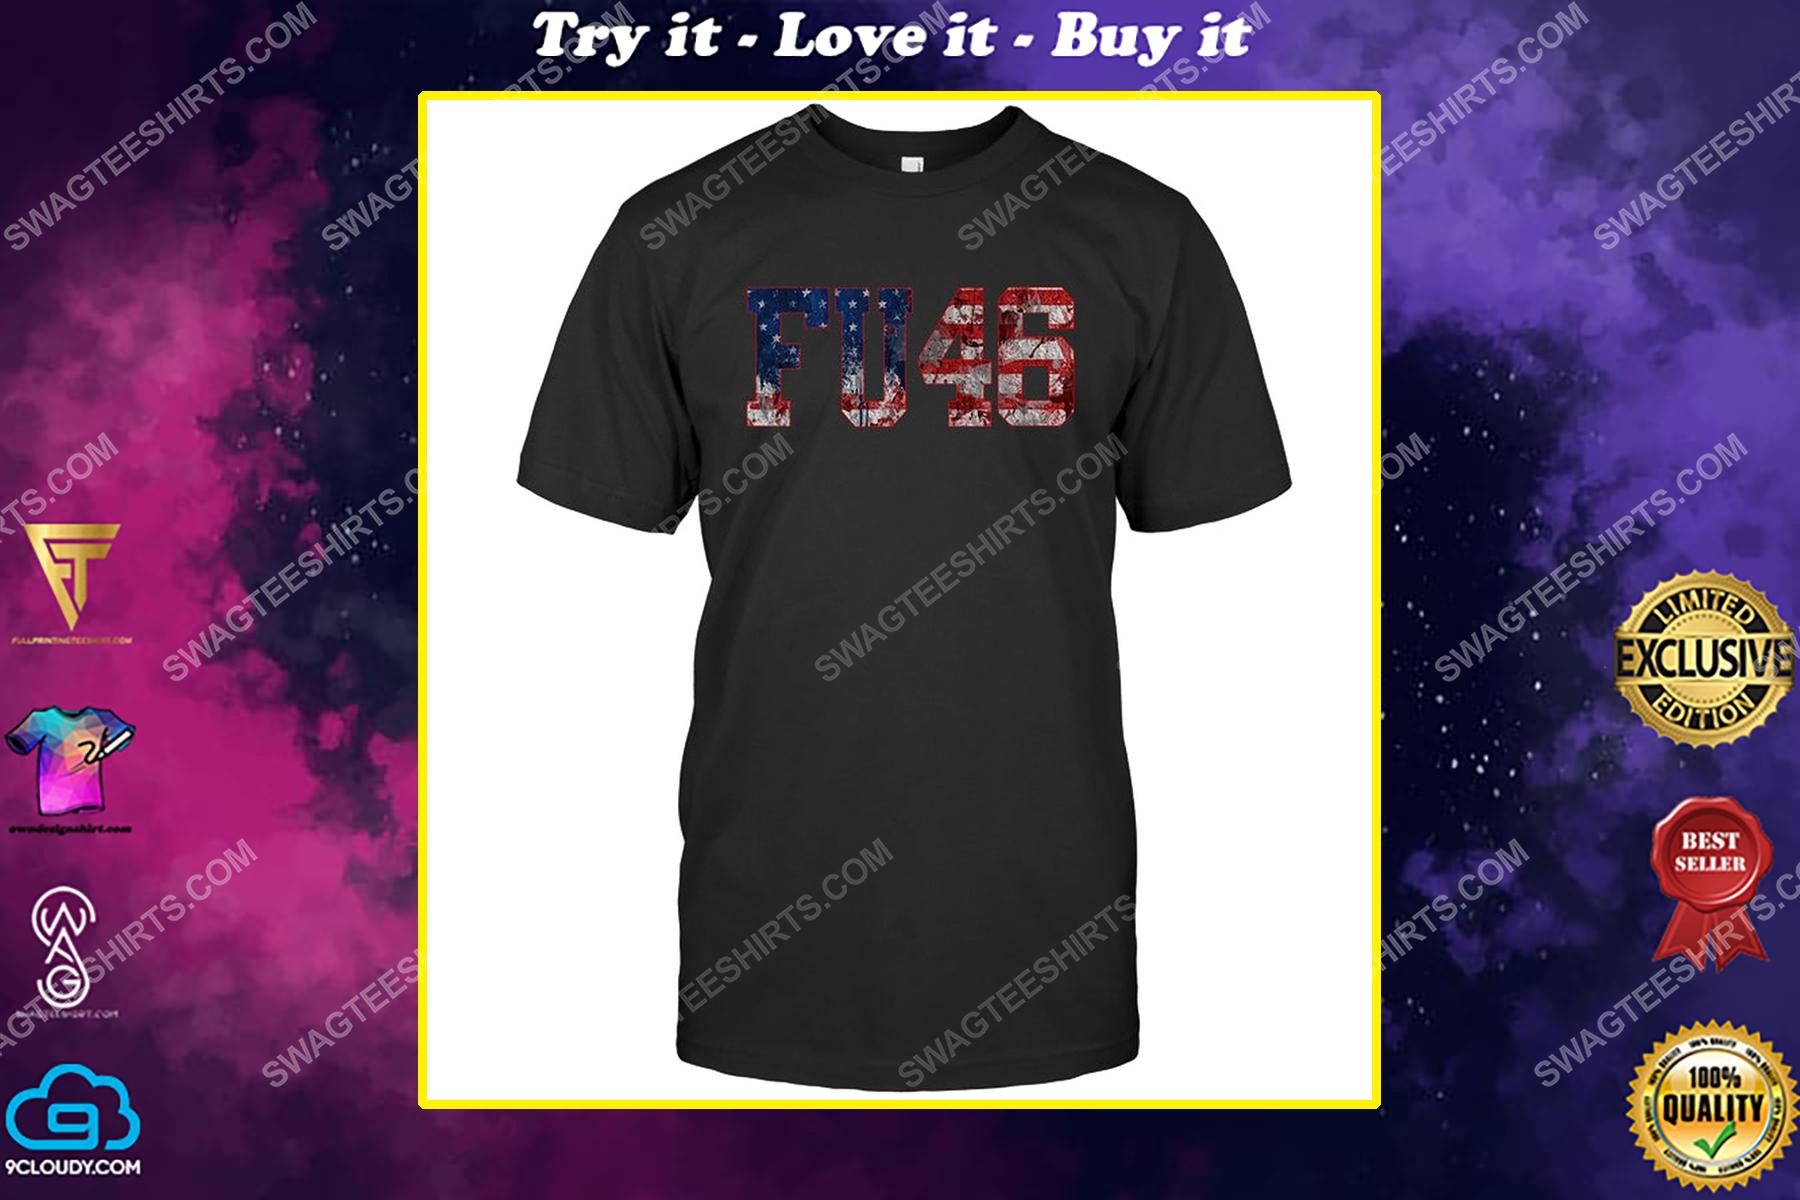 FU46 anti biden support trump political shirt